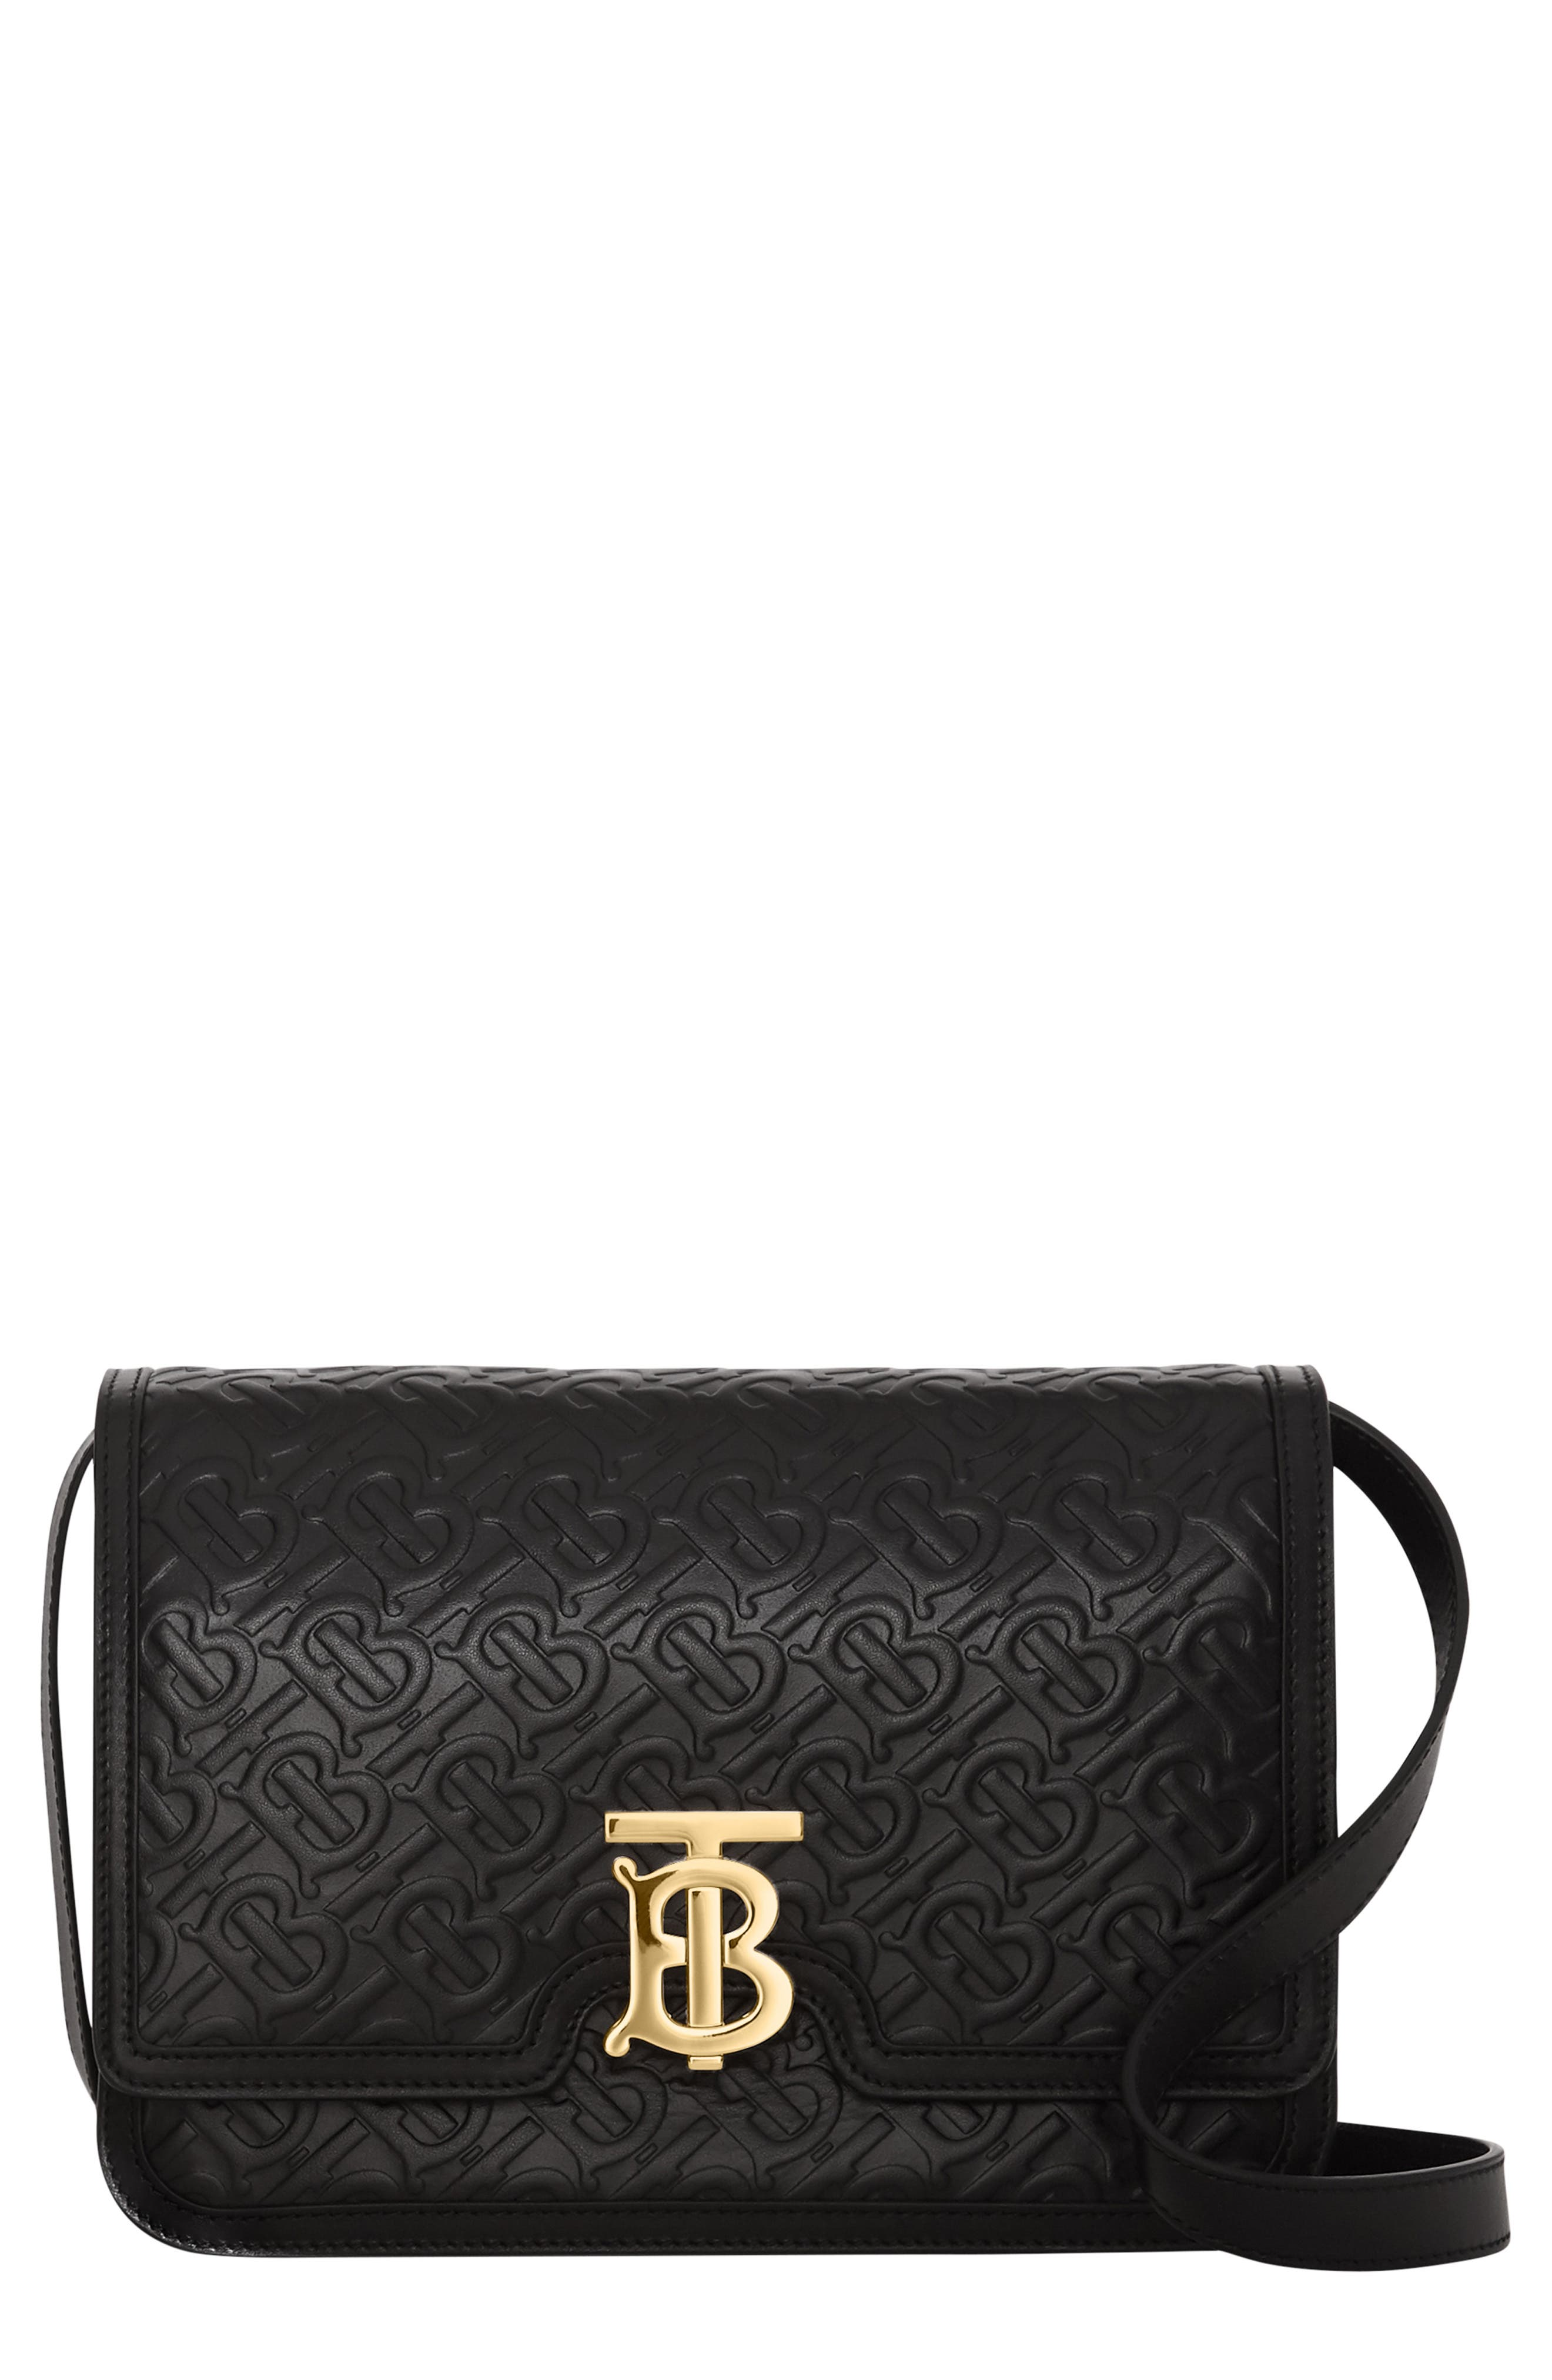 BURBERRY Medium TB Monogram Leather Bag, Main, color, BLACK